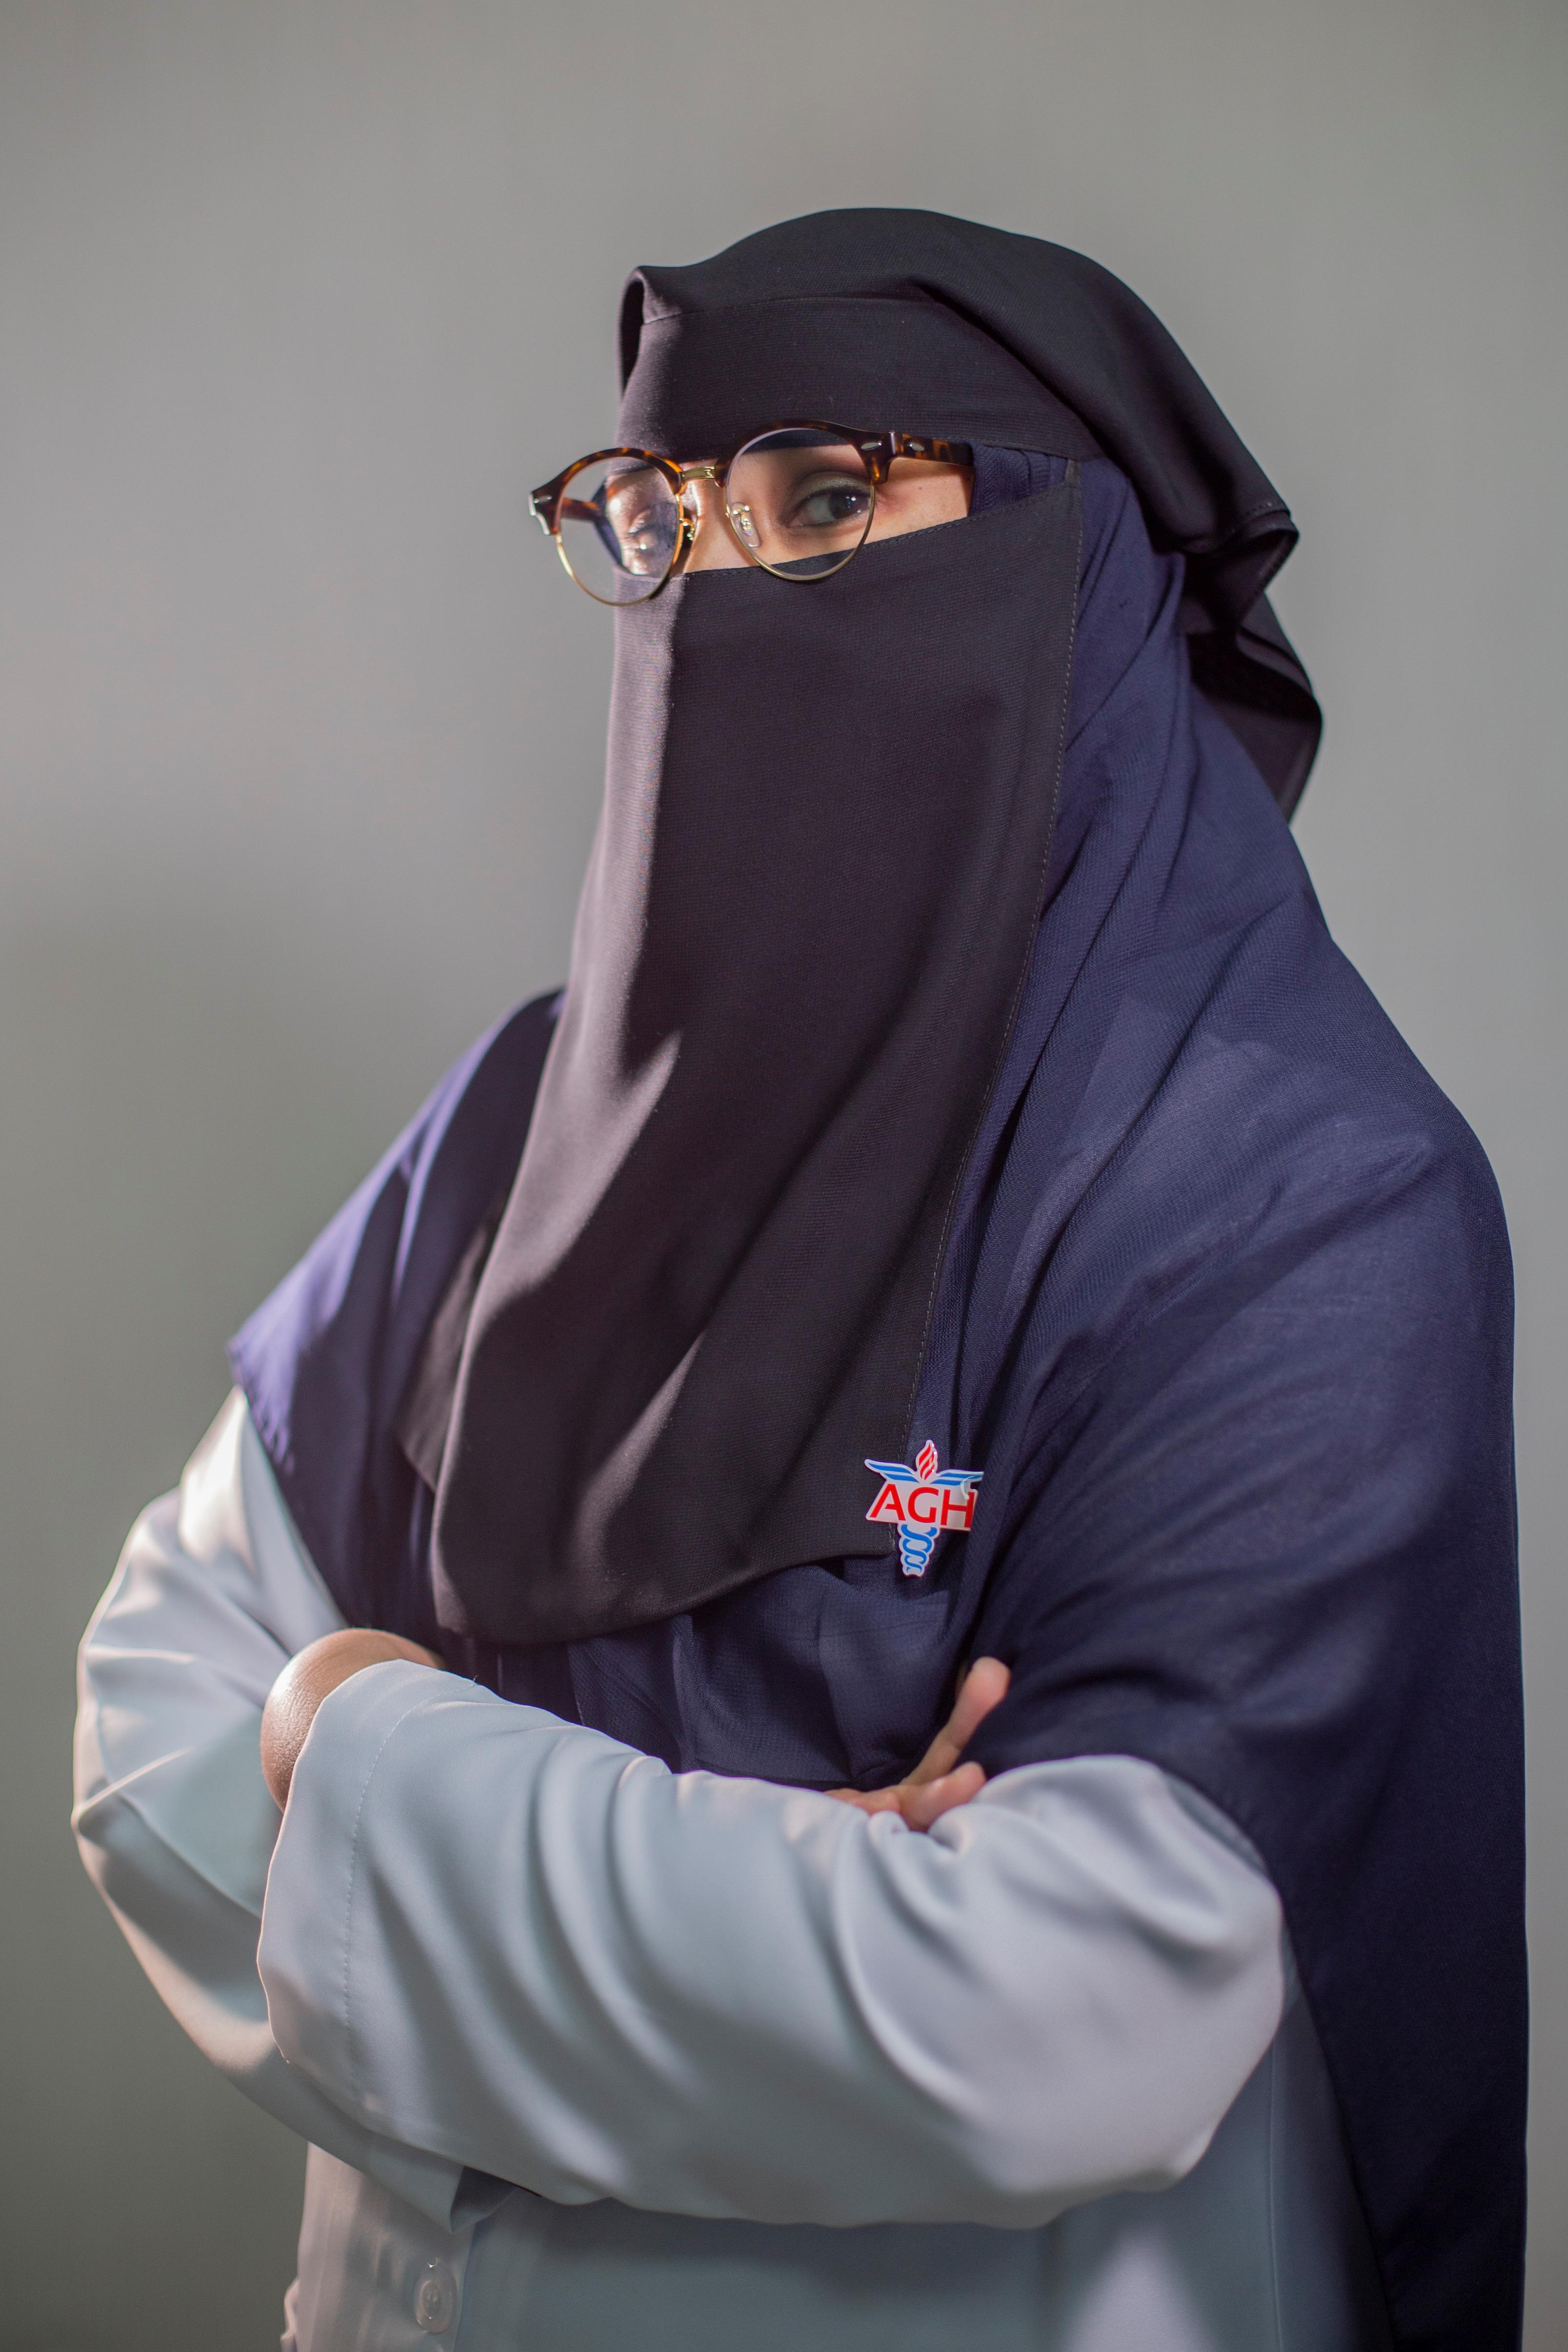 Fatima Abdelmalik Omer